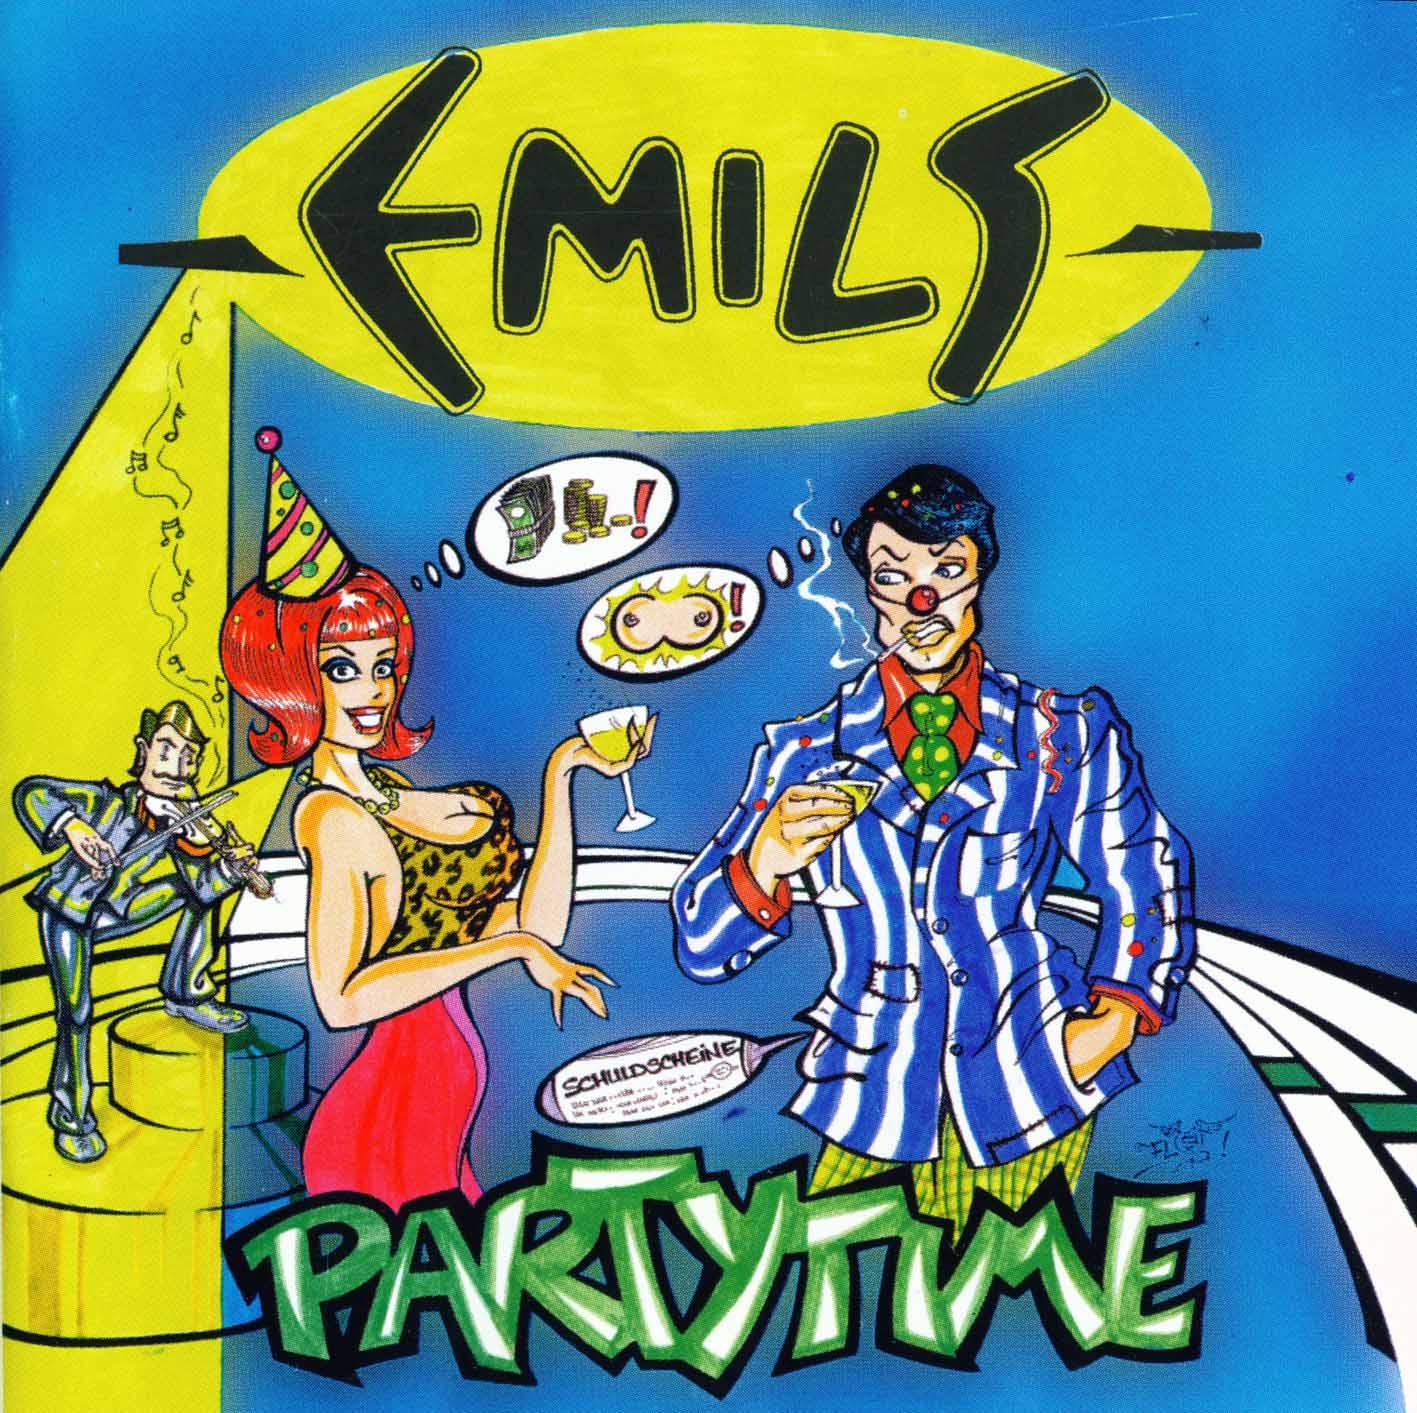 Emils - Partytime 1997